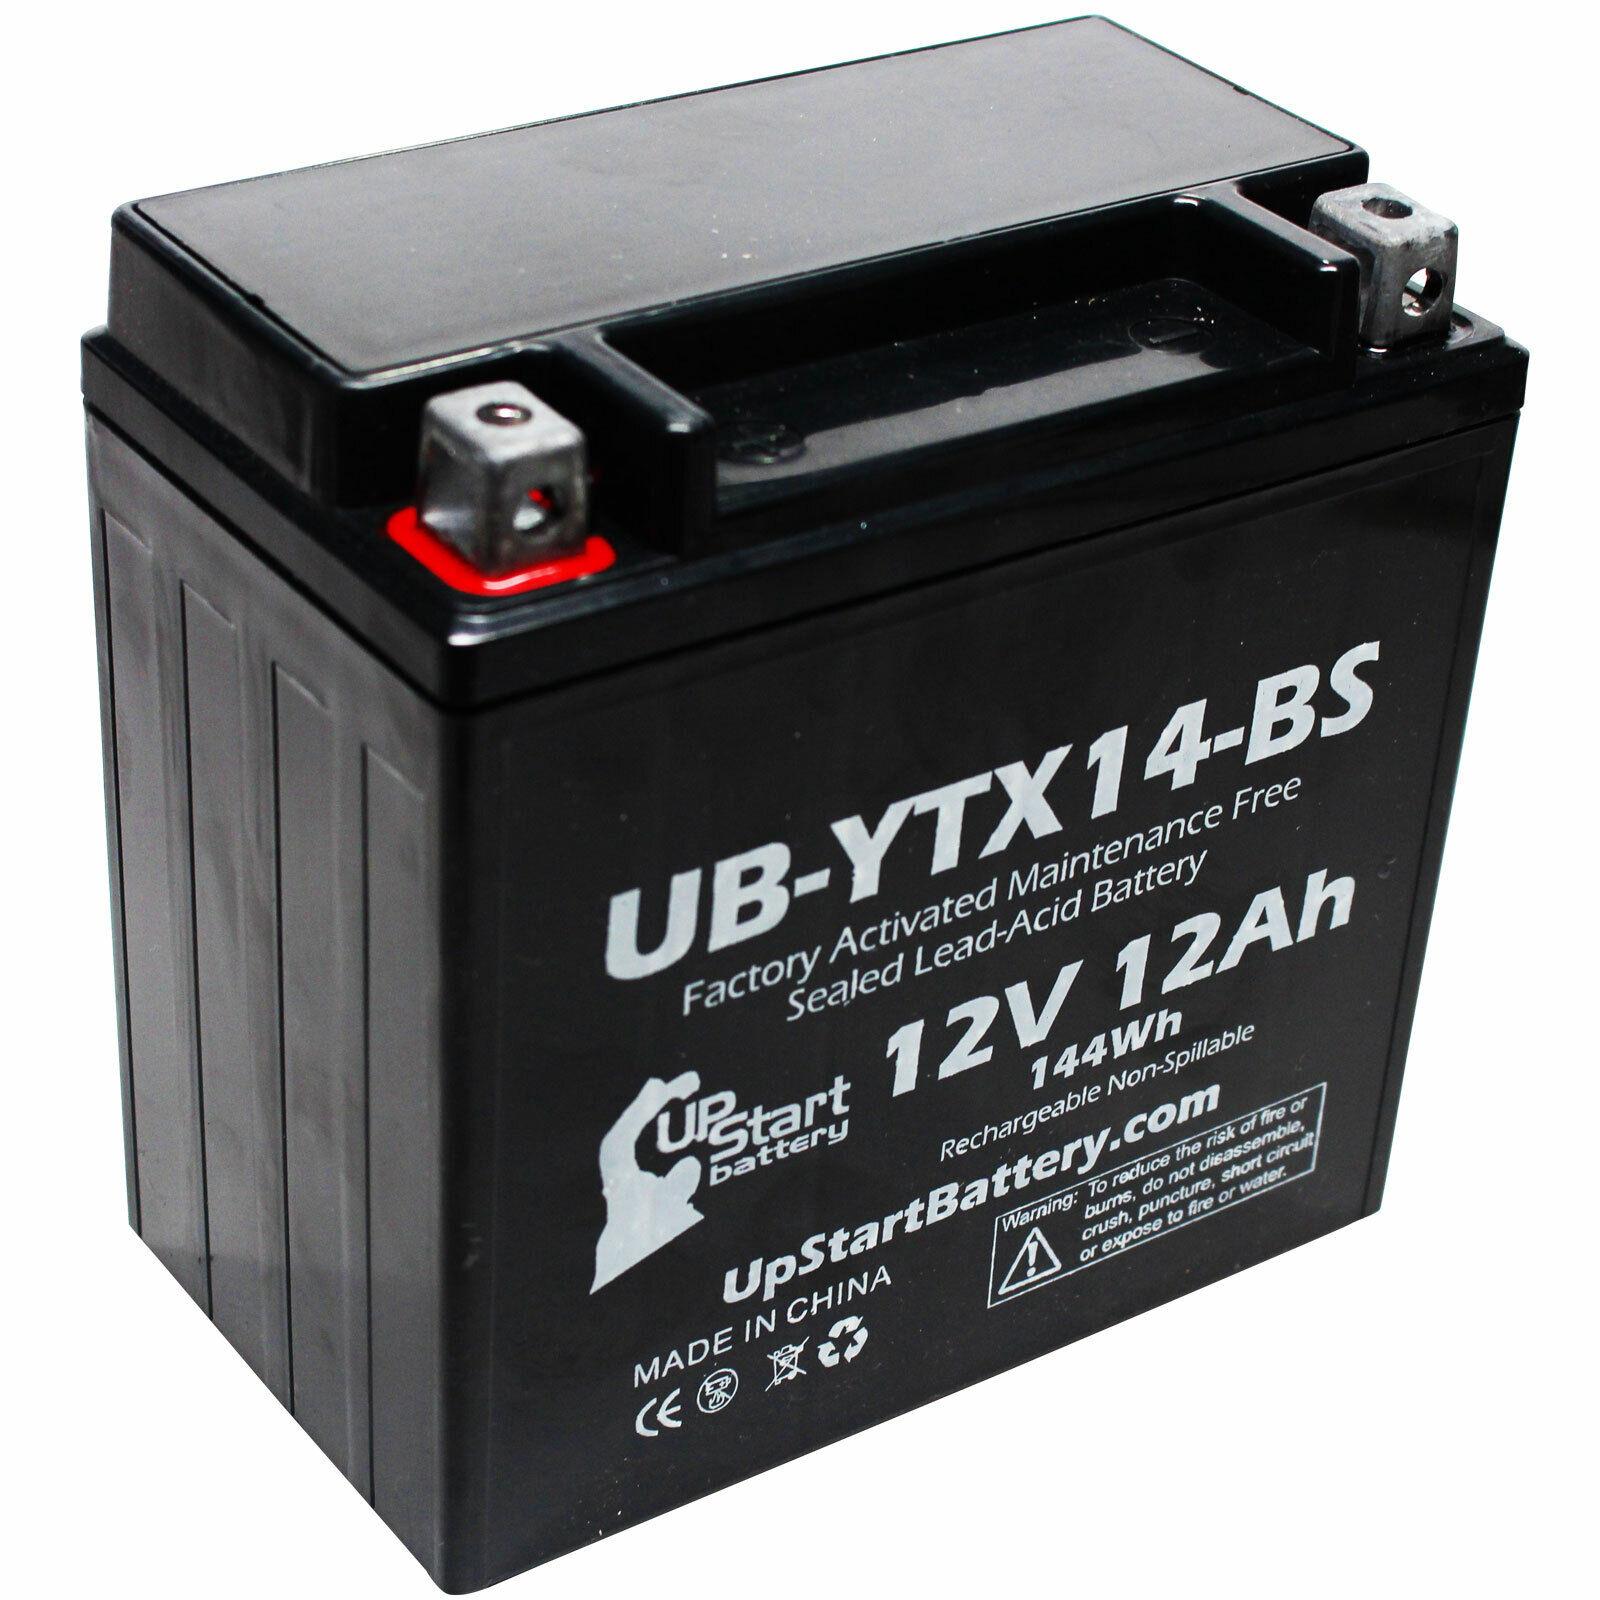 12V 12AH Battery for 1990 Honda TRX300 Fourtrax 300 CC